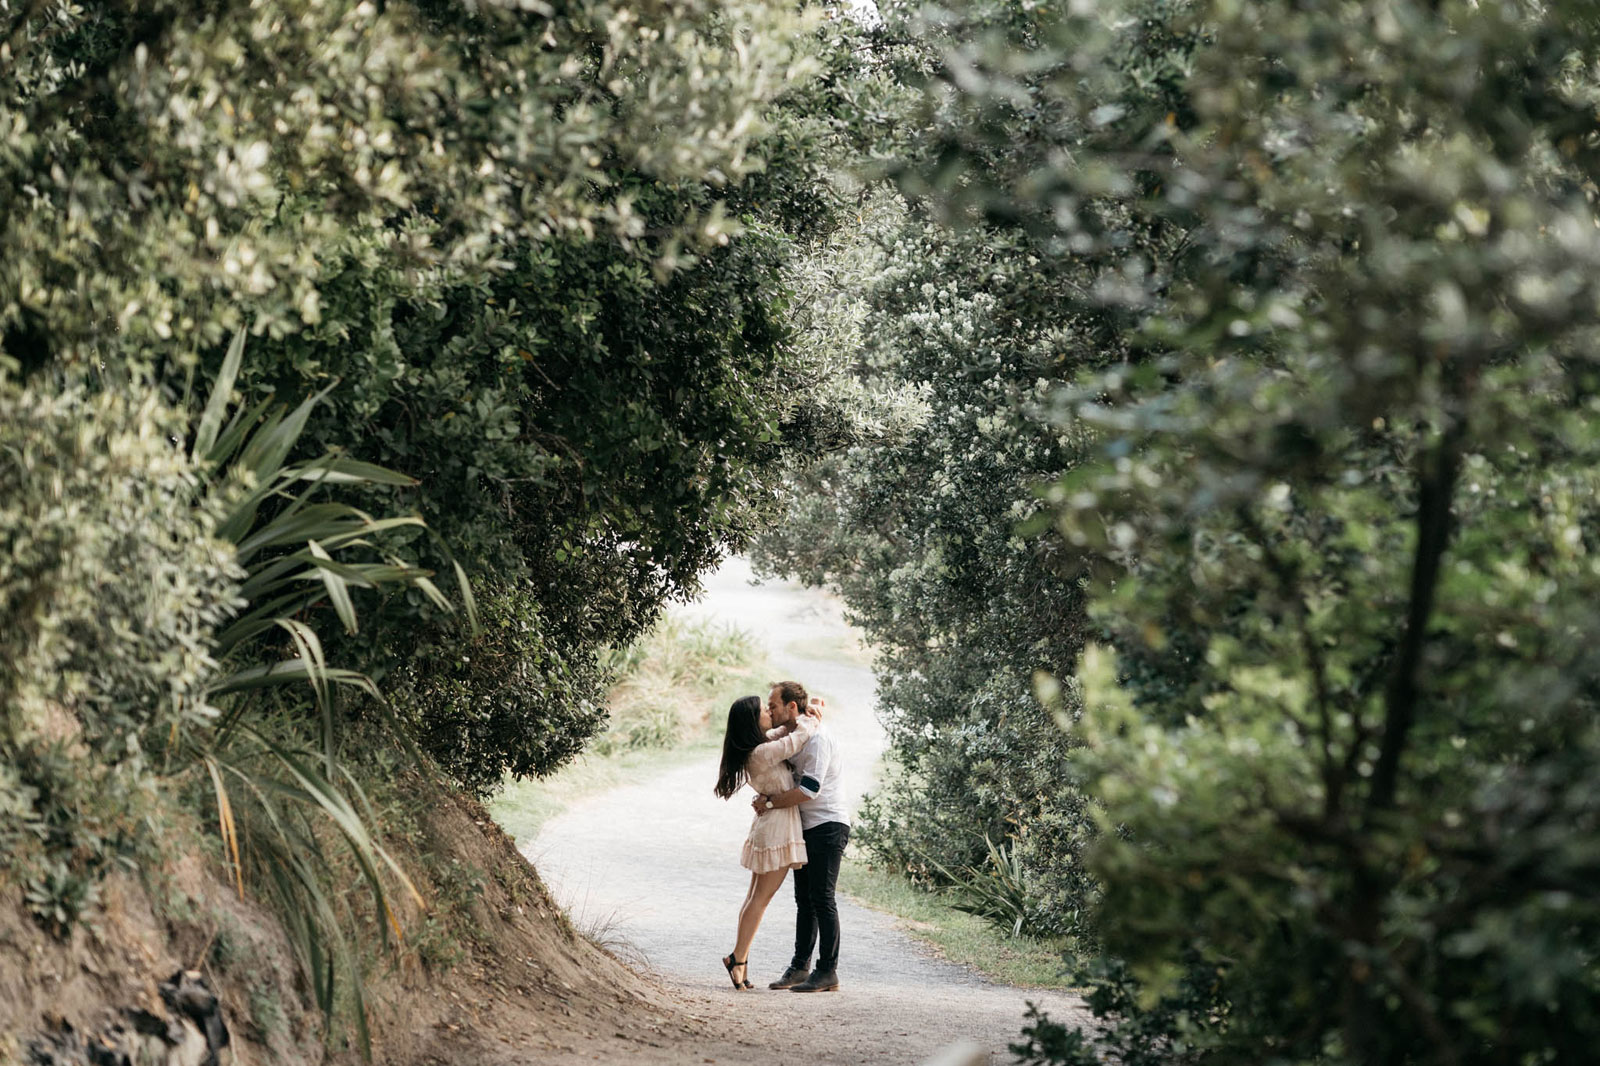 newfound-e-m-mt-maunganui-tauranga-wedding-photographer-017-a